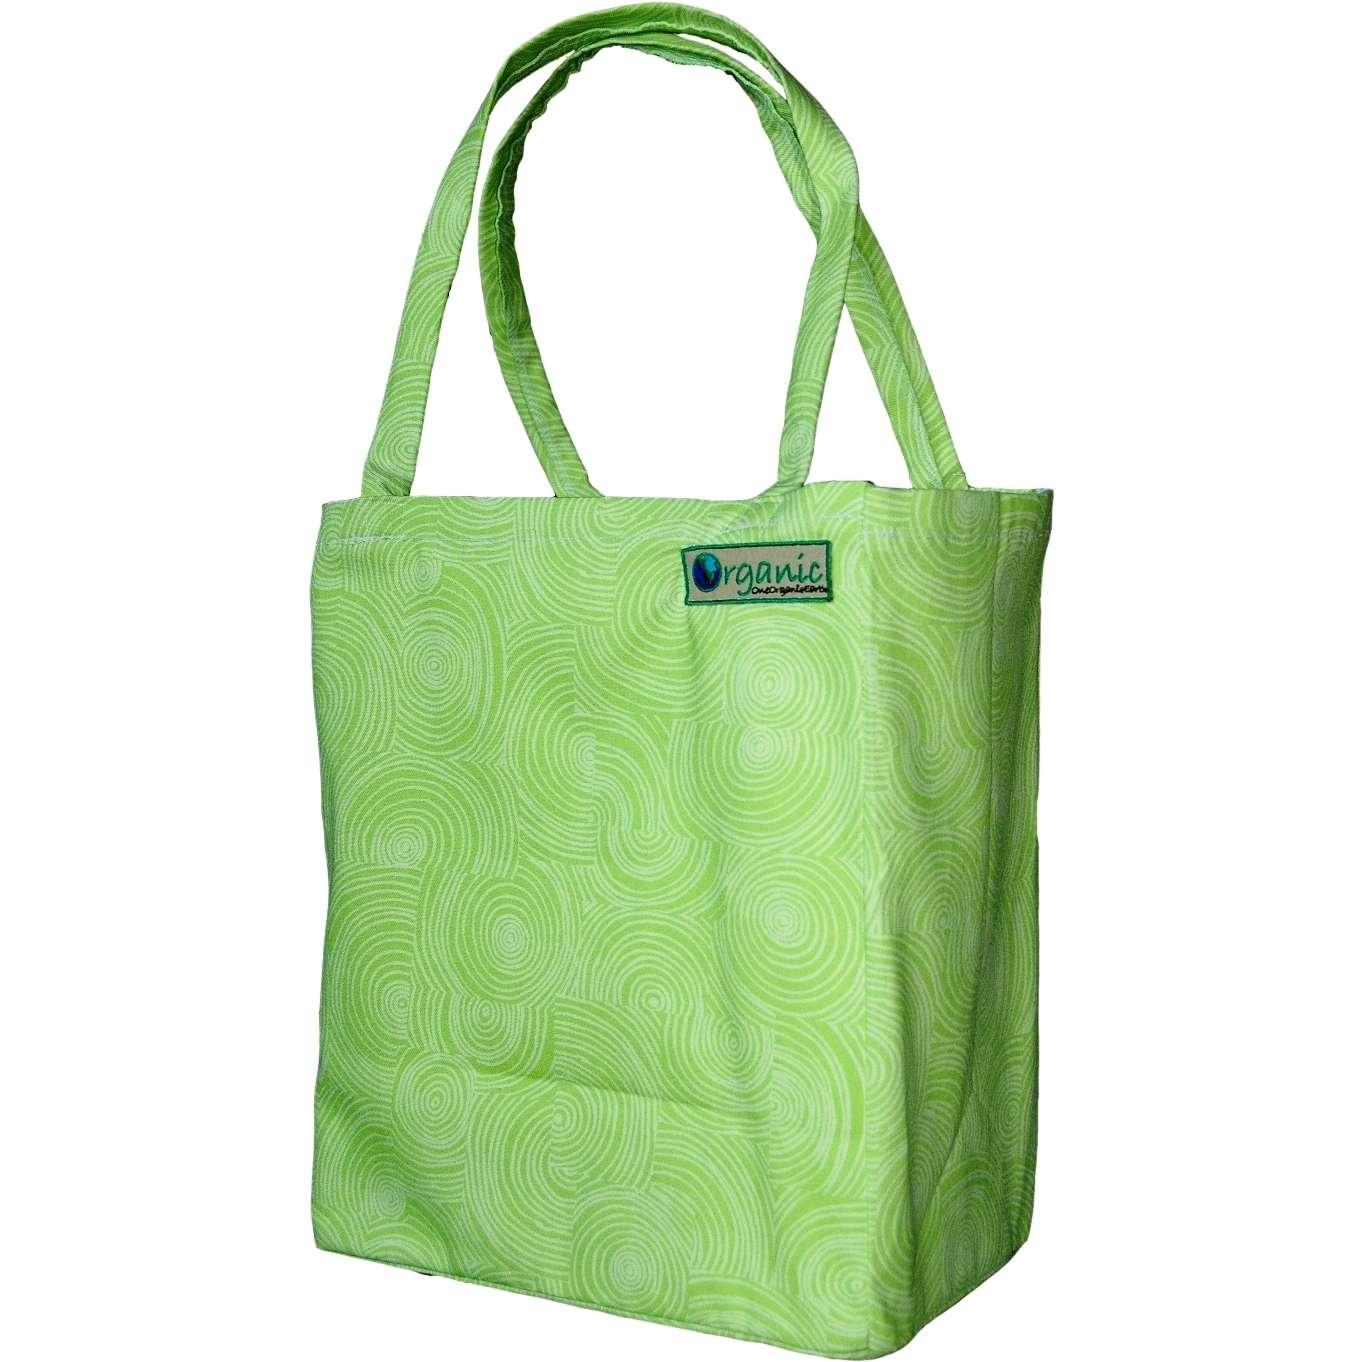 1362x1362 Filereusable Shopping Bag.jpg Uncyclopedia Fandom Powered By